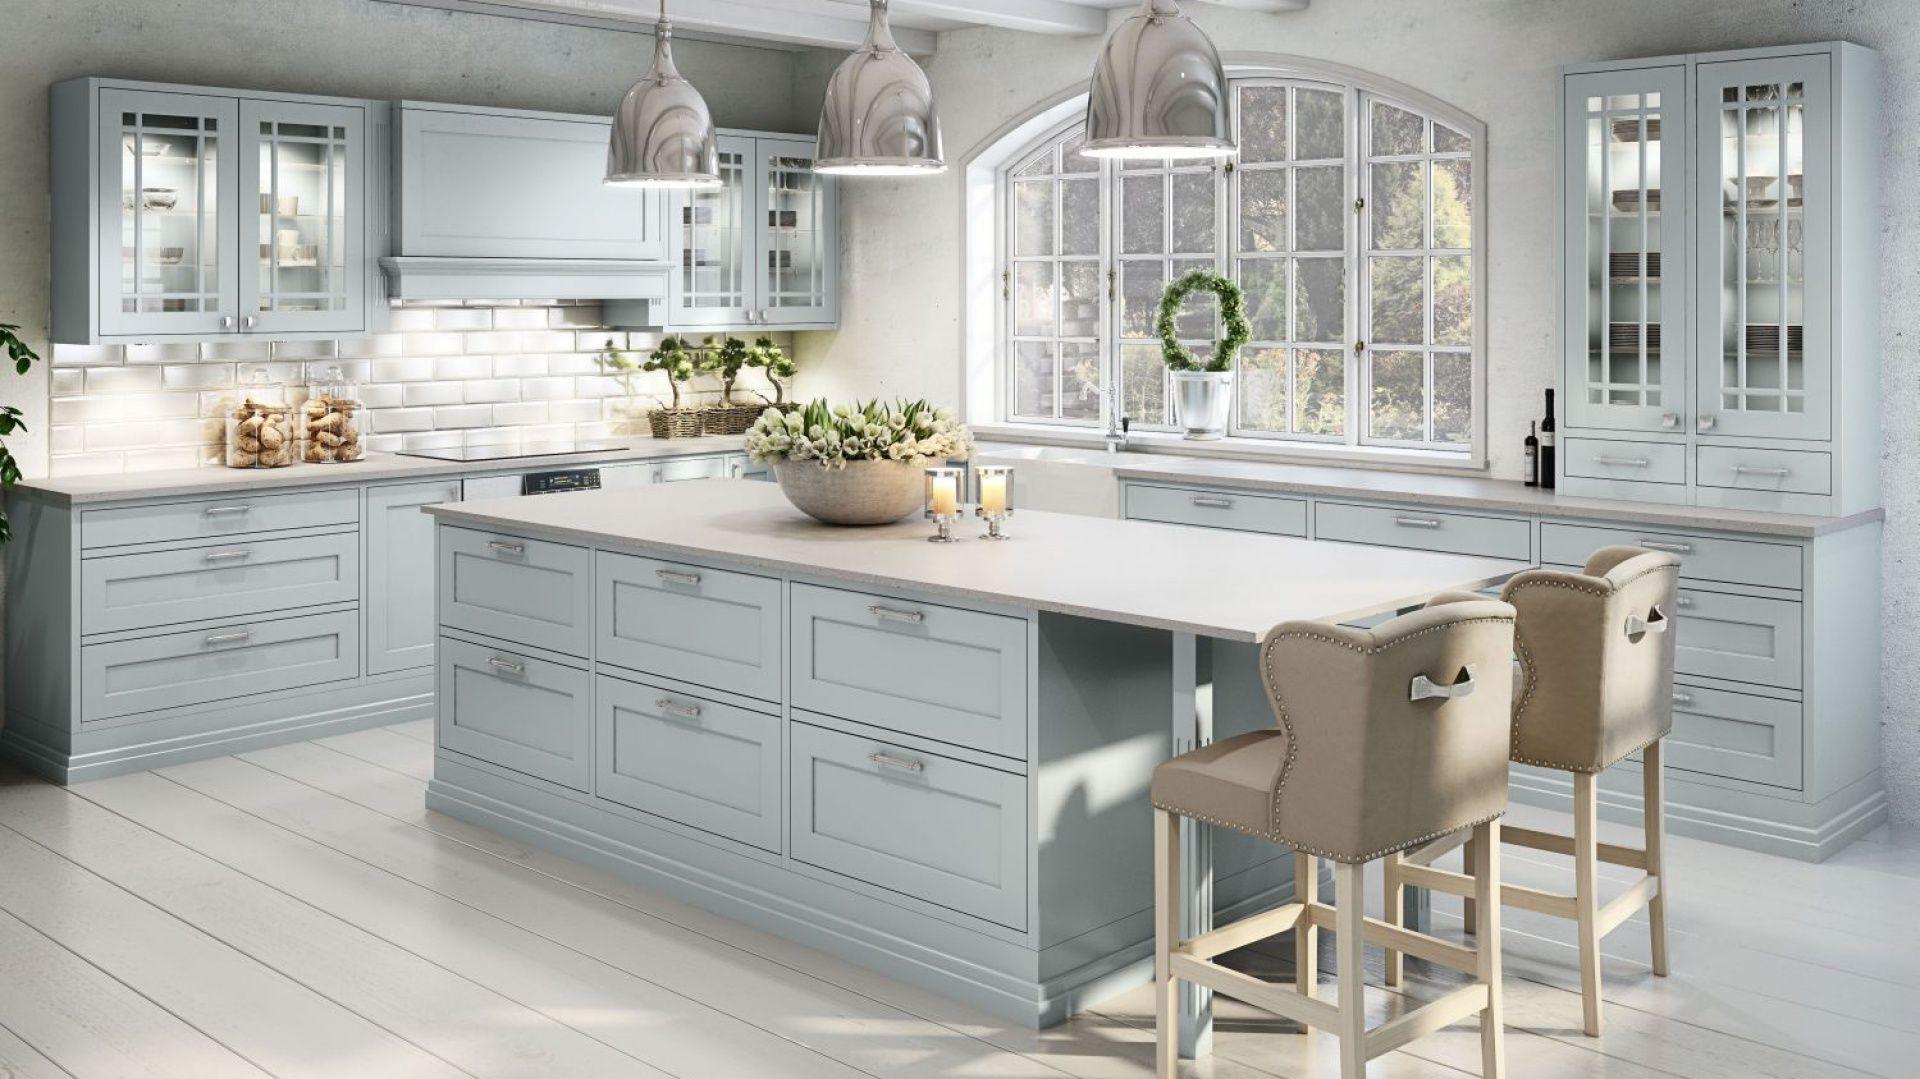 Klasyczna Kuchnia W Stylu Prowansalskim Kitchen Decor Open Plan Kitchen Dining Living Kitchen Inspirations